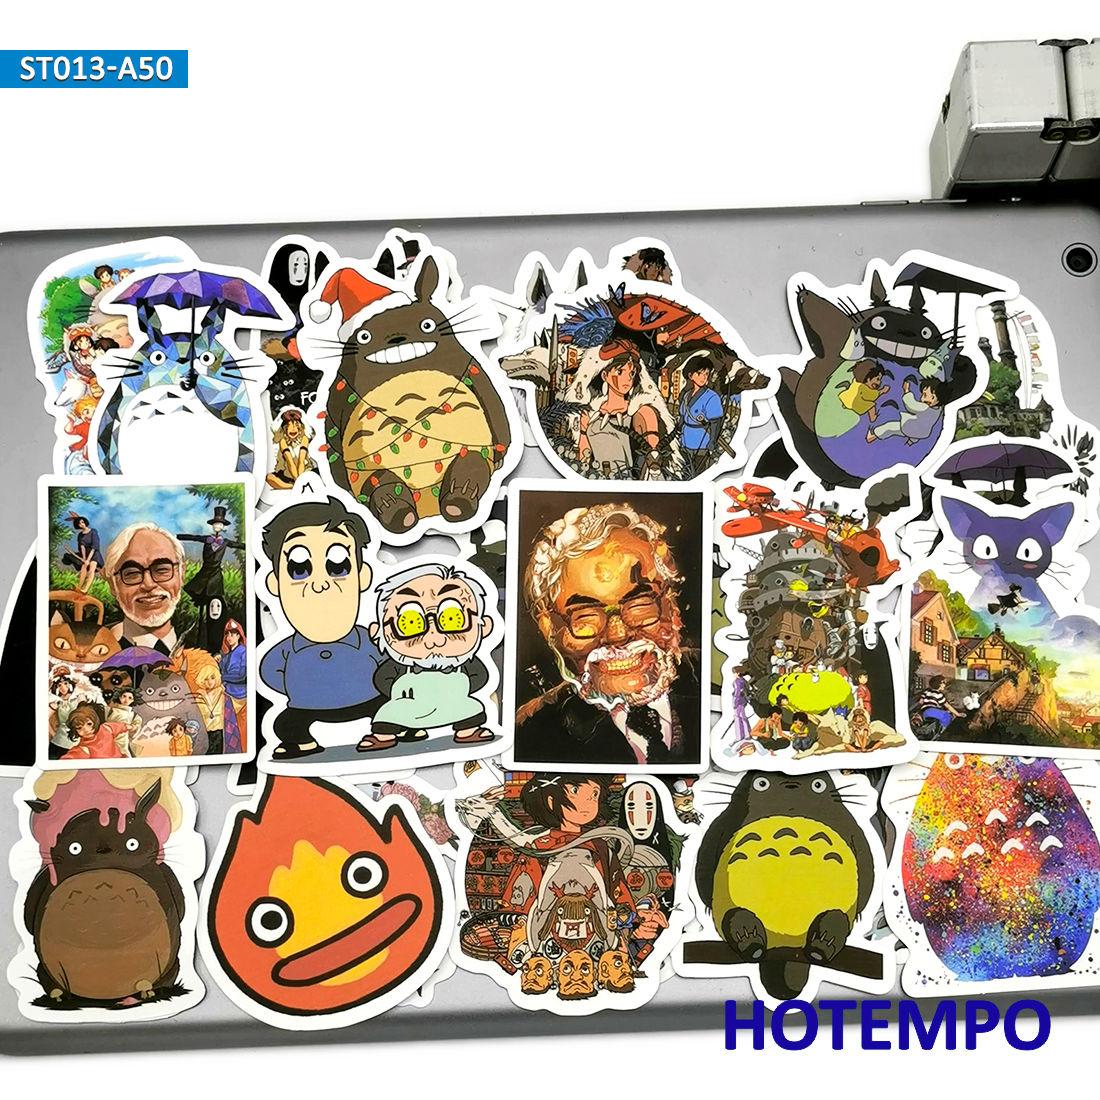 50pcs Anime Movie Manga Miyazaki Hayao Cute Cartoon Stickers Toys for Kids Mobile Phone Laptop Luggage Skateboard Decal Stickers(China)